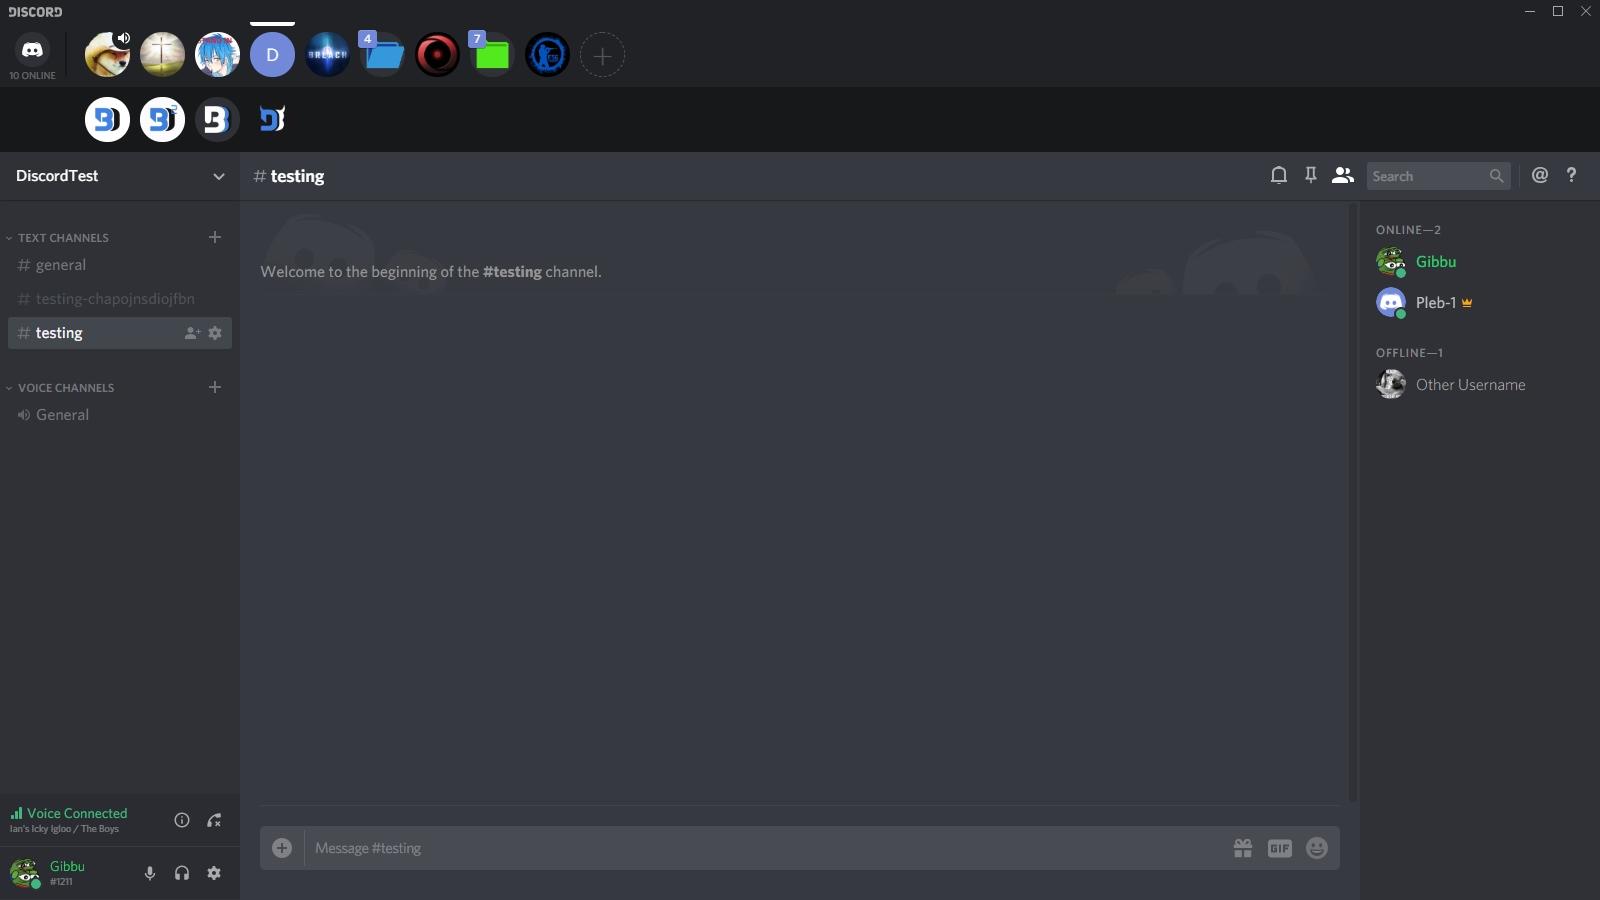 ServerFolders Support